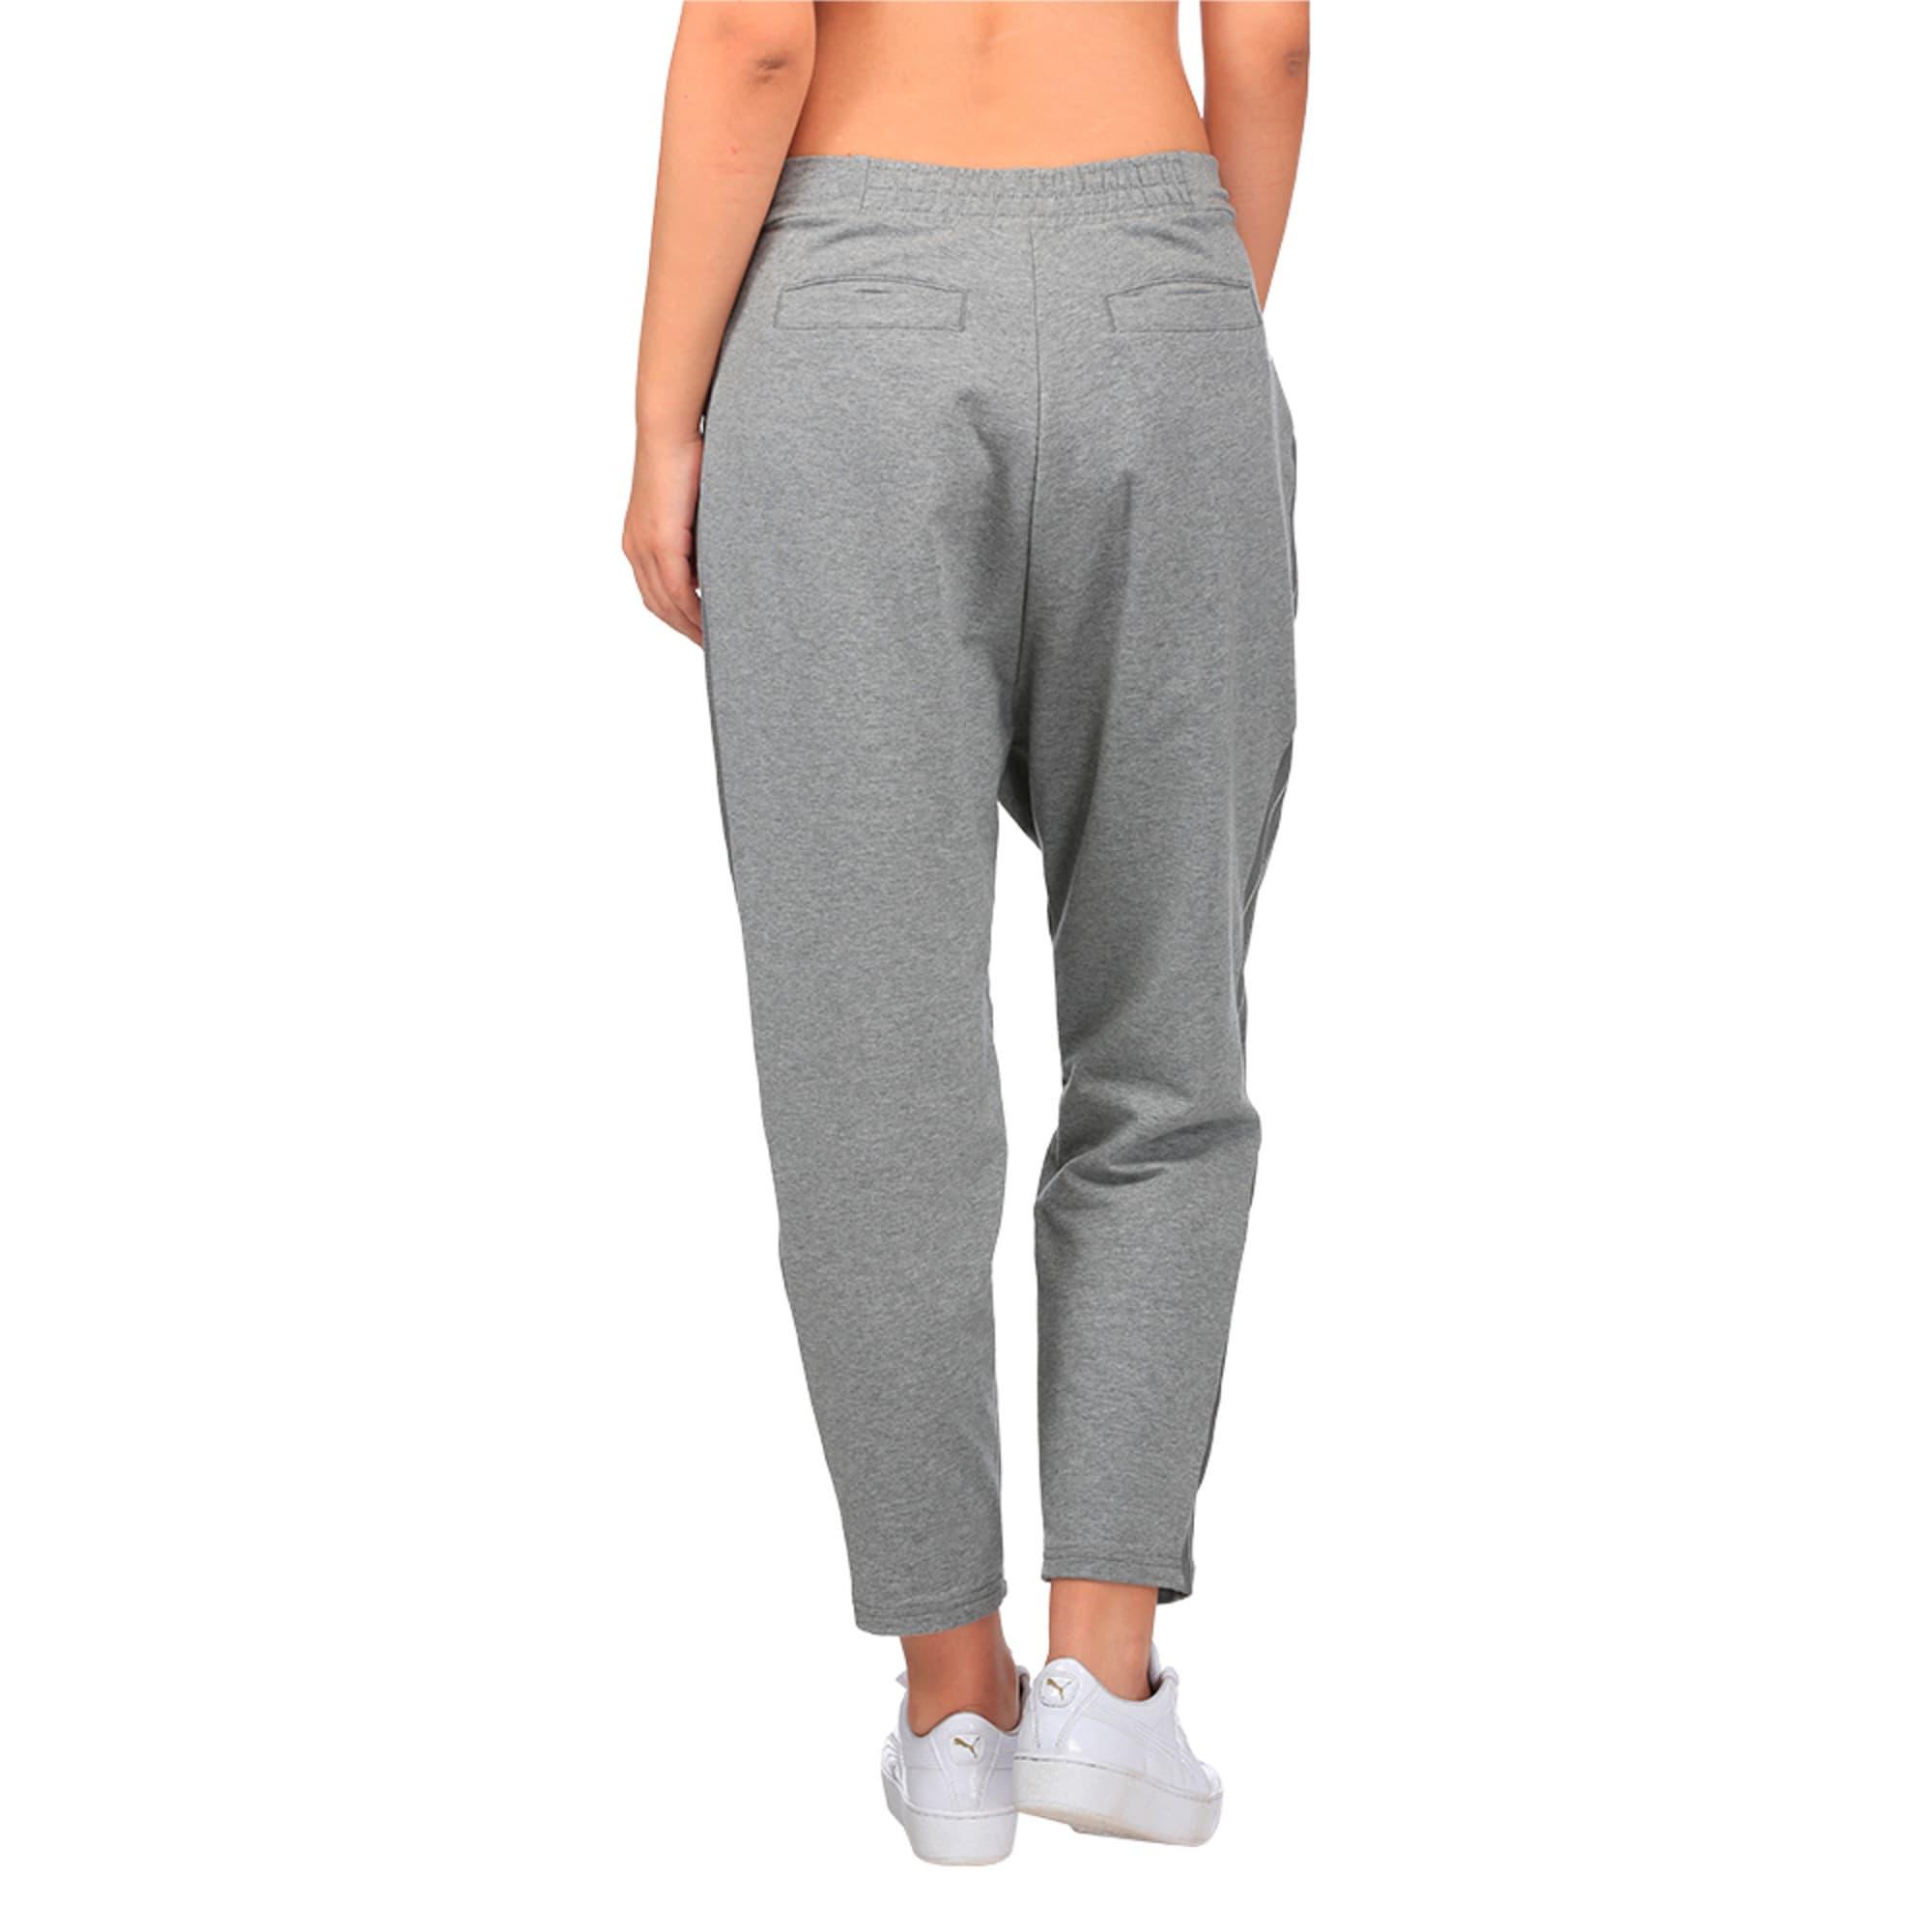 Thumbnail 3 of Evolution Women's Tape High Waist Sweatpants, Medium Gray Heather, medium-IND